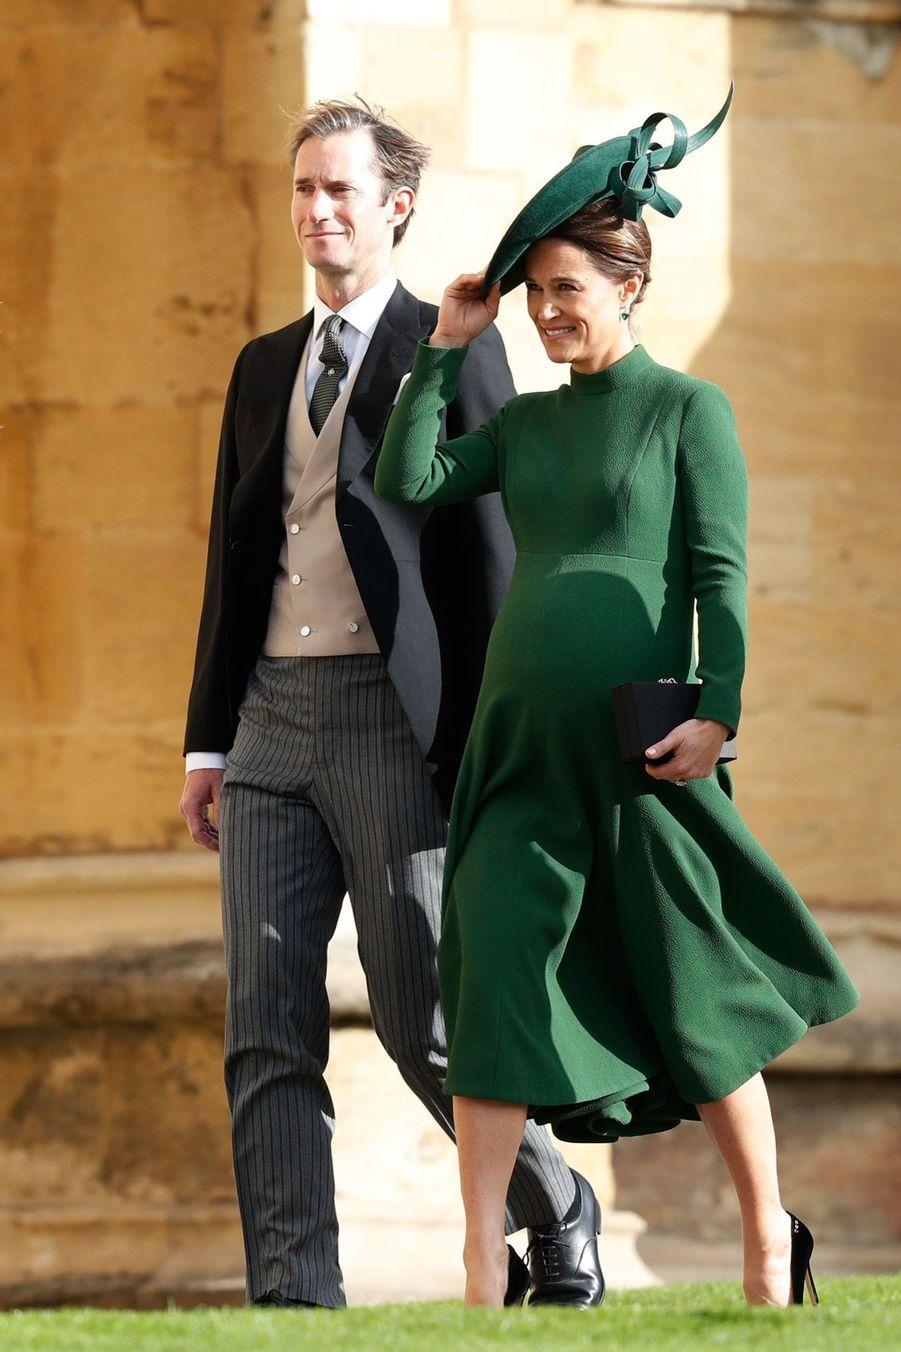 Pippa Middleton Très Enceinte Au Mariage De La Princesse Eugenie D'York ( 1